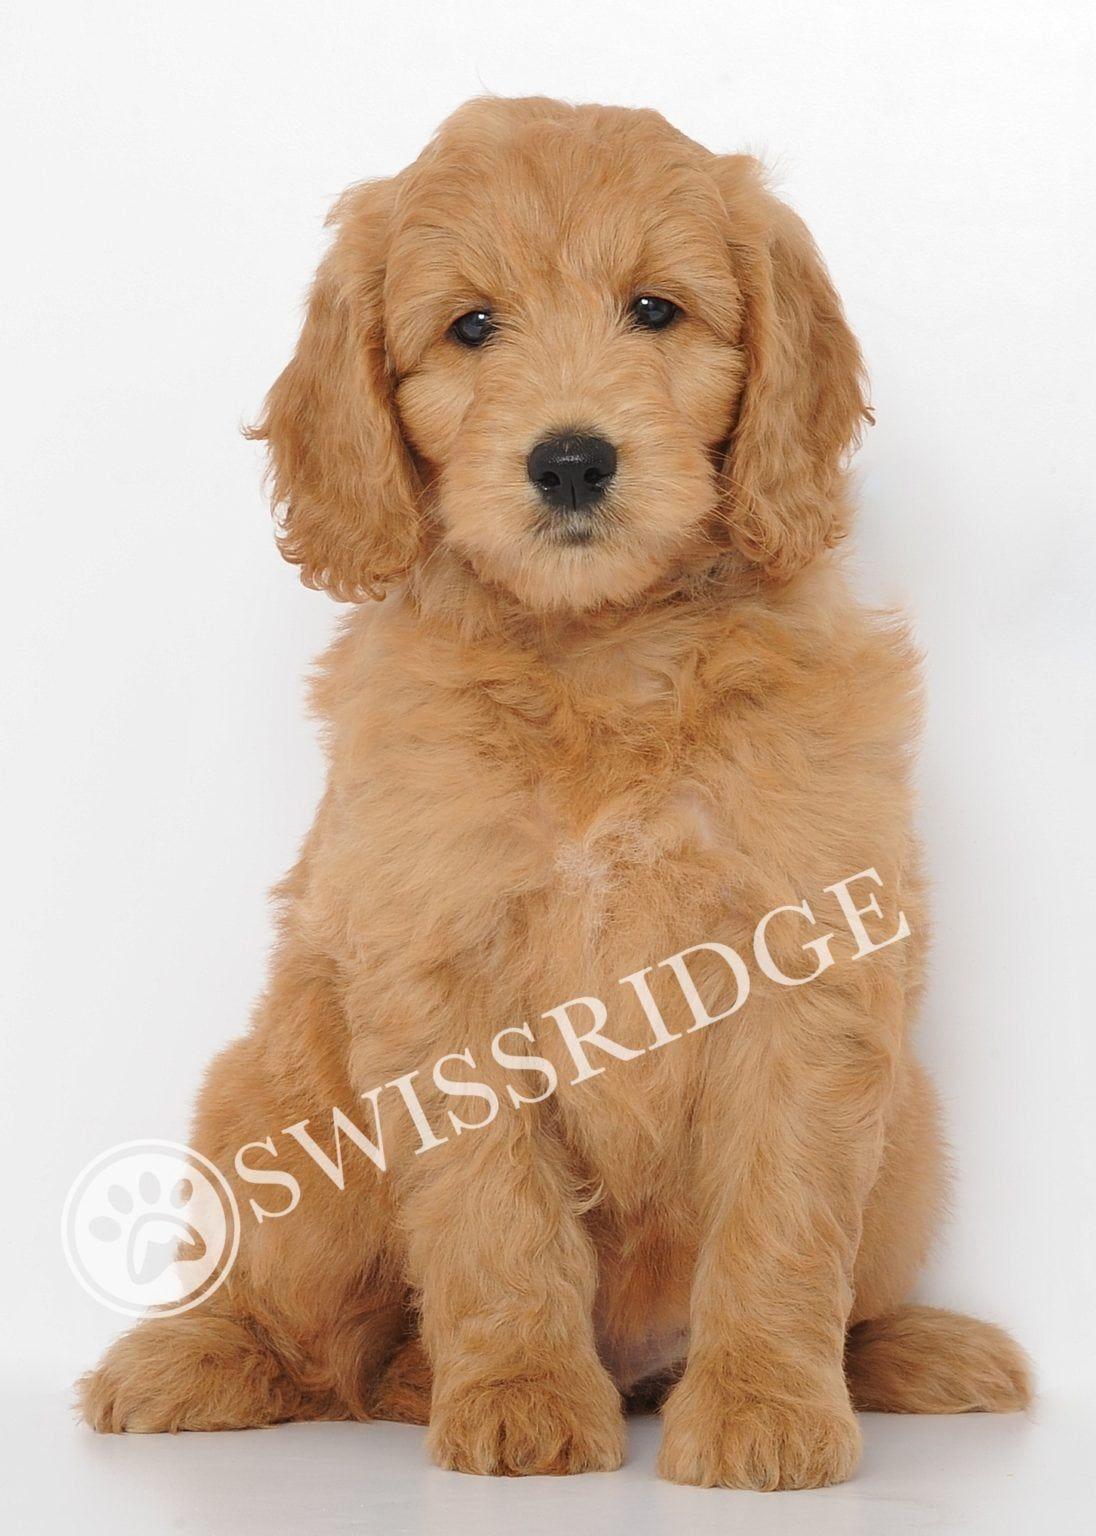 Swissridge Mini Golden Doodles Mini Pinterest Goldendoodle